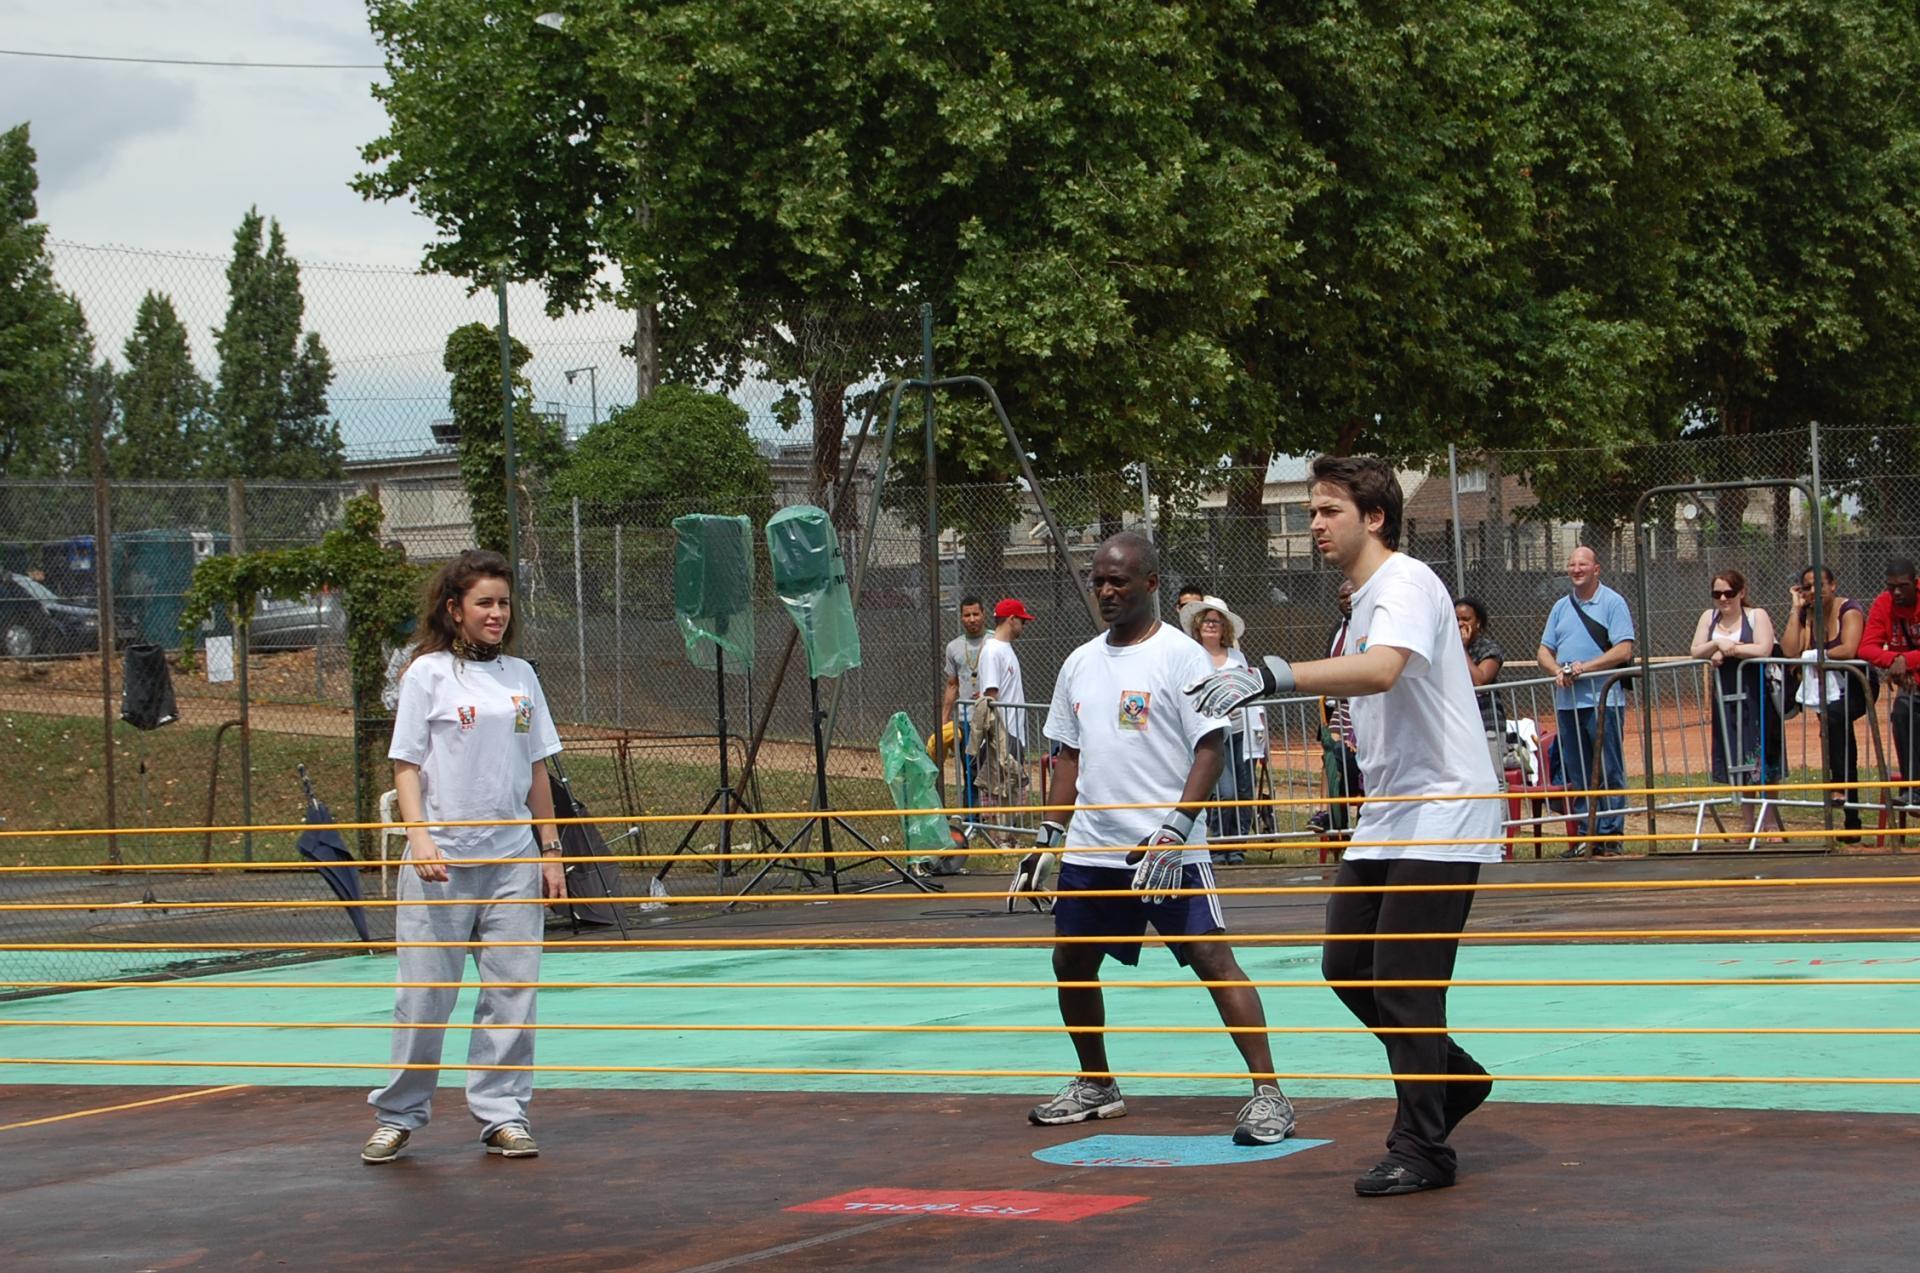 Evenement sportif caritatif (le As'Ball Melun 2010)